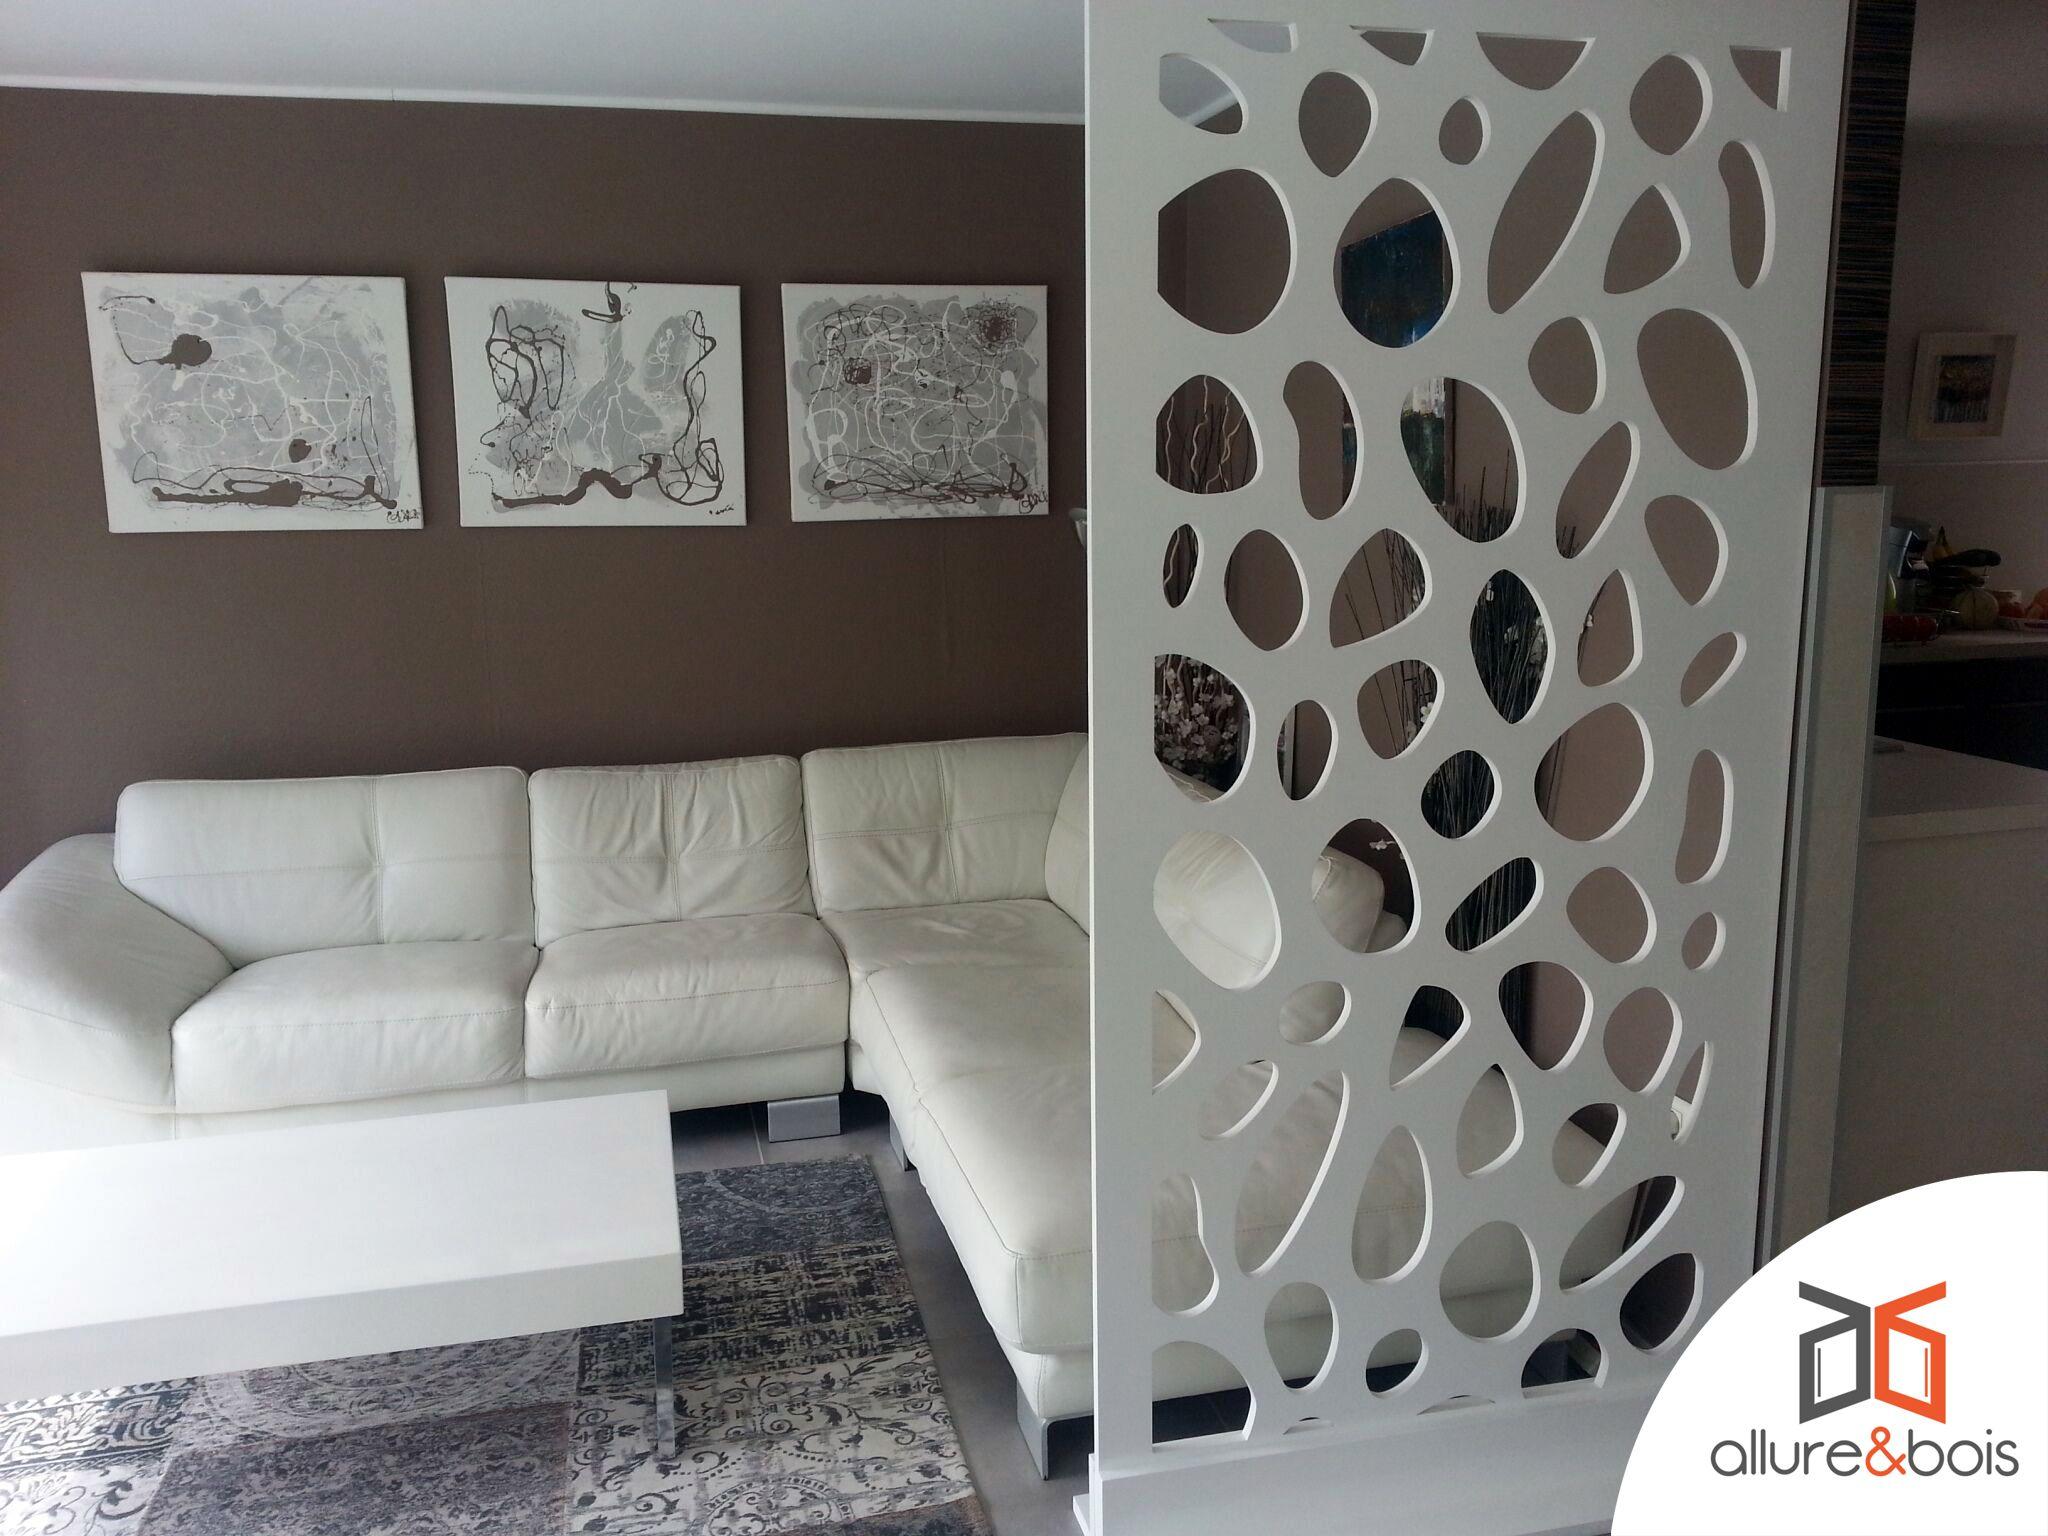 claustra maya moucharabieh pinterest brise vue brise et int rieur. Black Bedroom Furniture Sets. Home Design Ideas